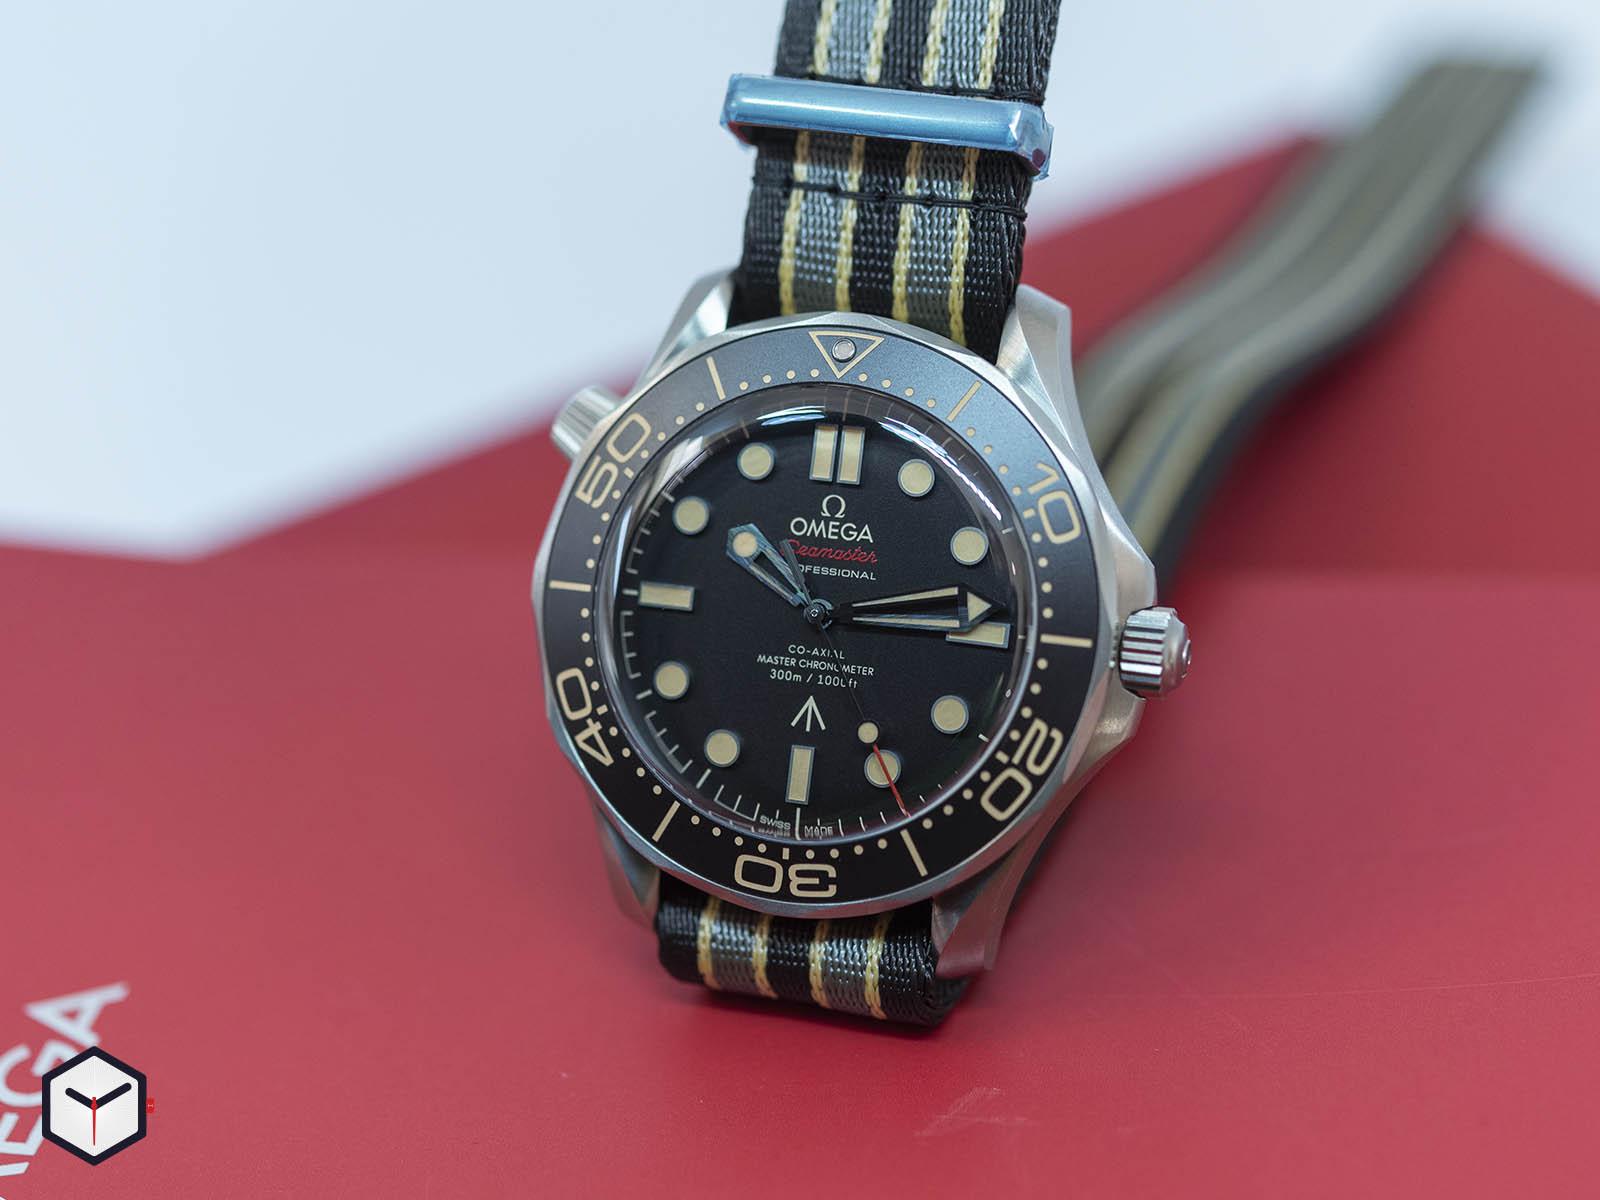 210-92-42-20-01-001-omega-seamaster-diver-300m-007-edition-3.jpg